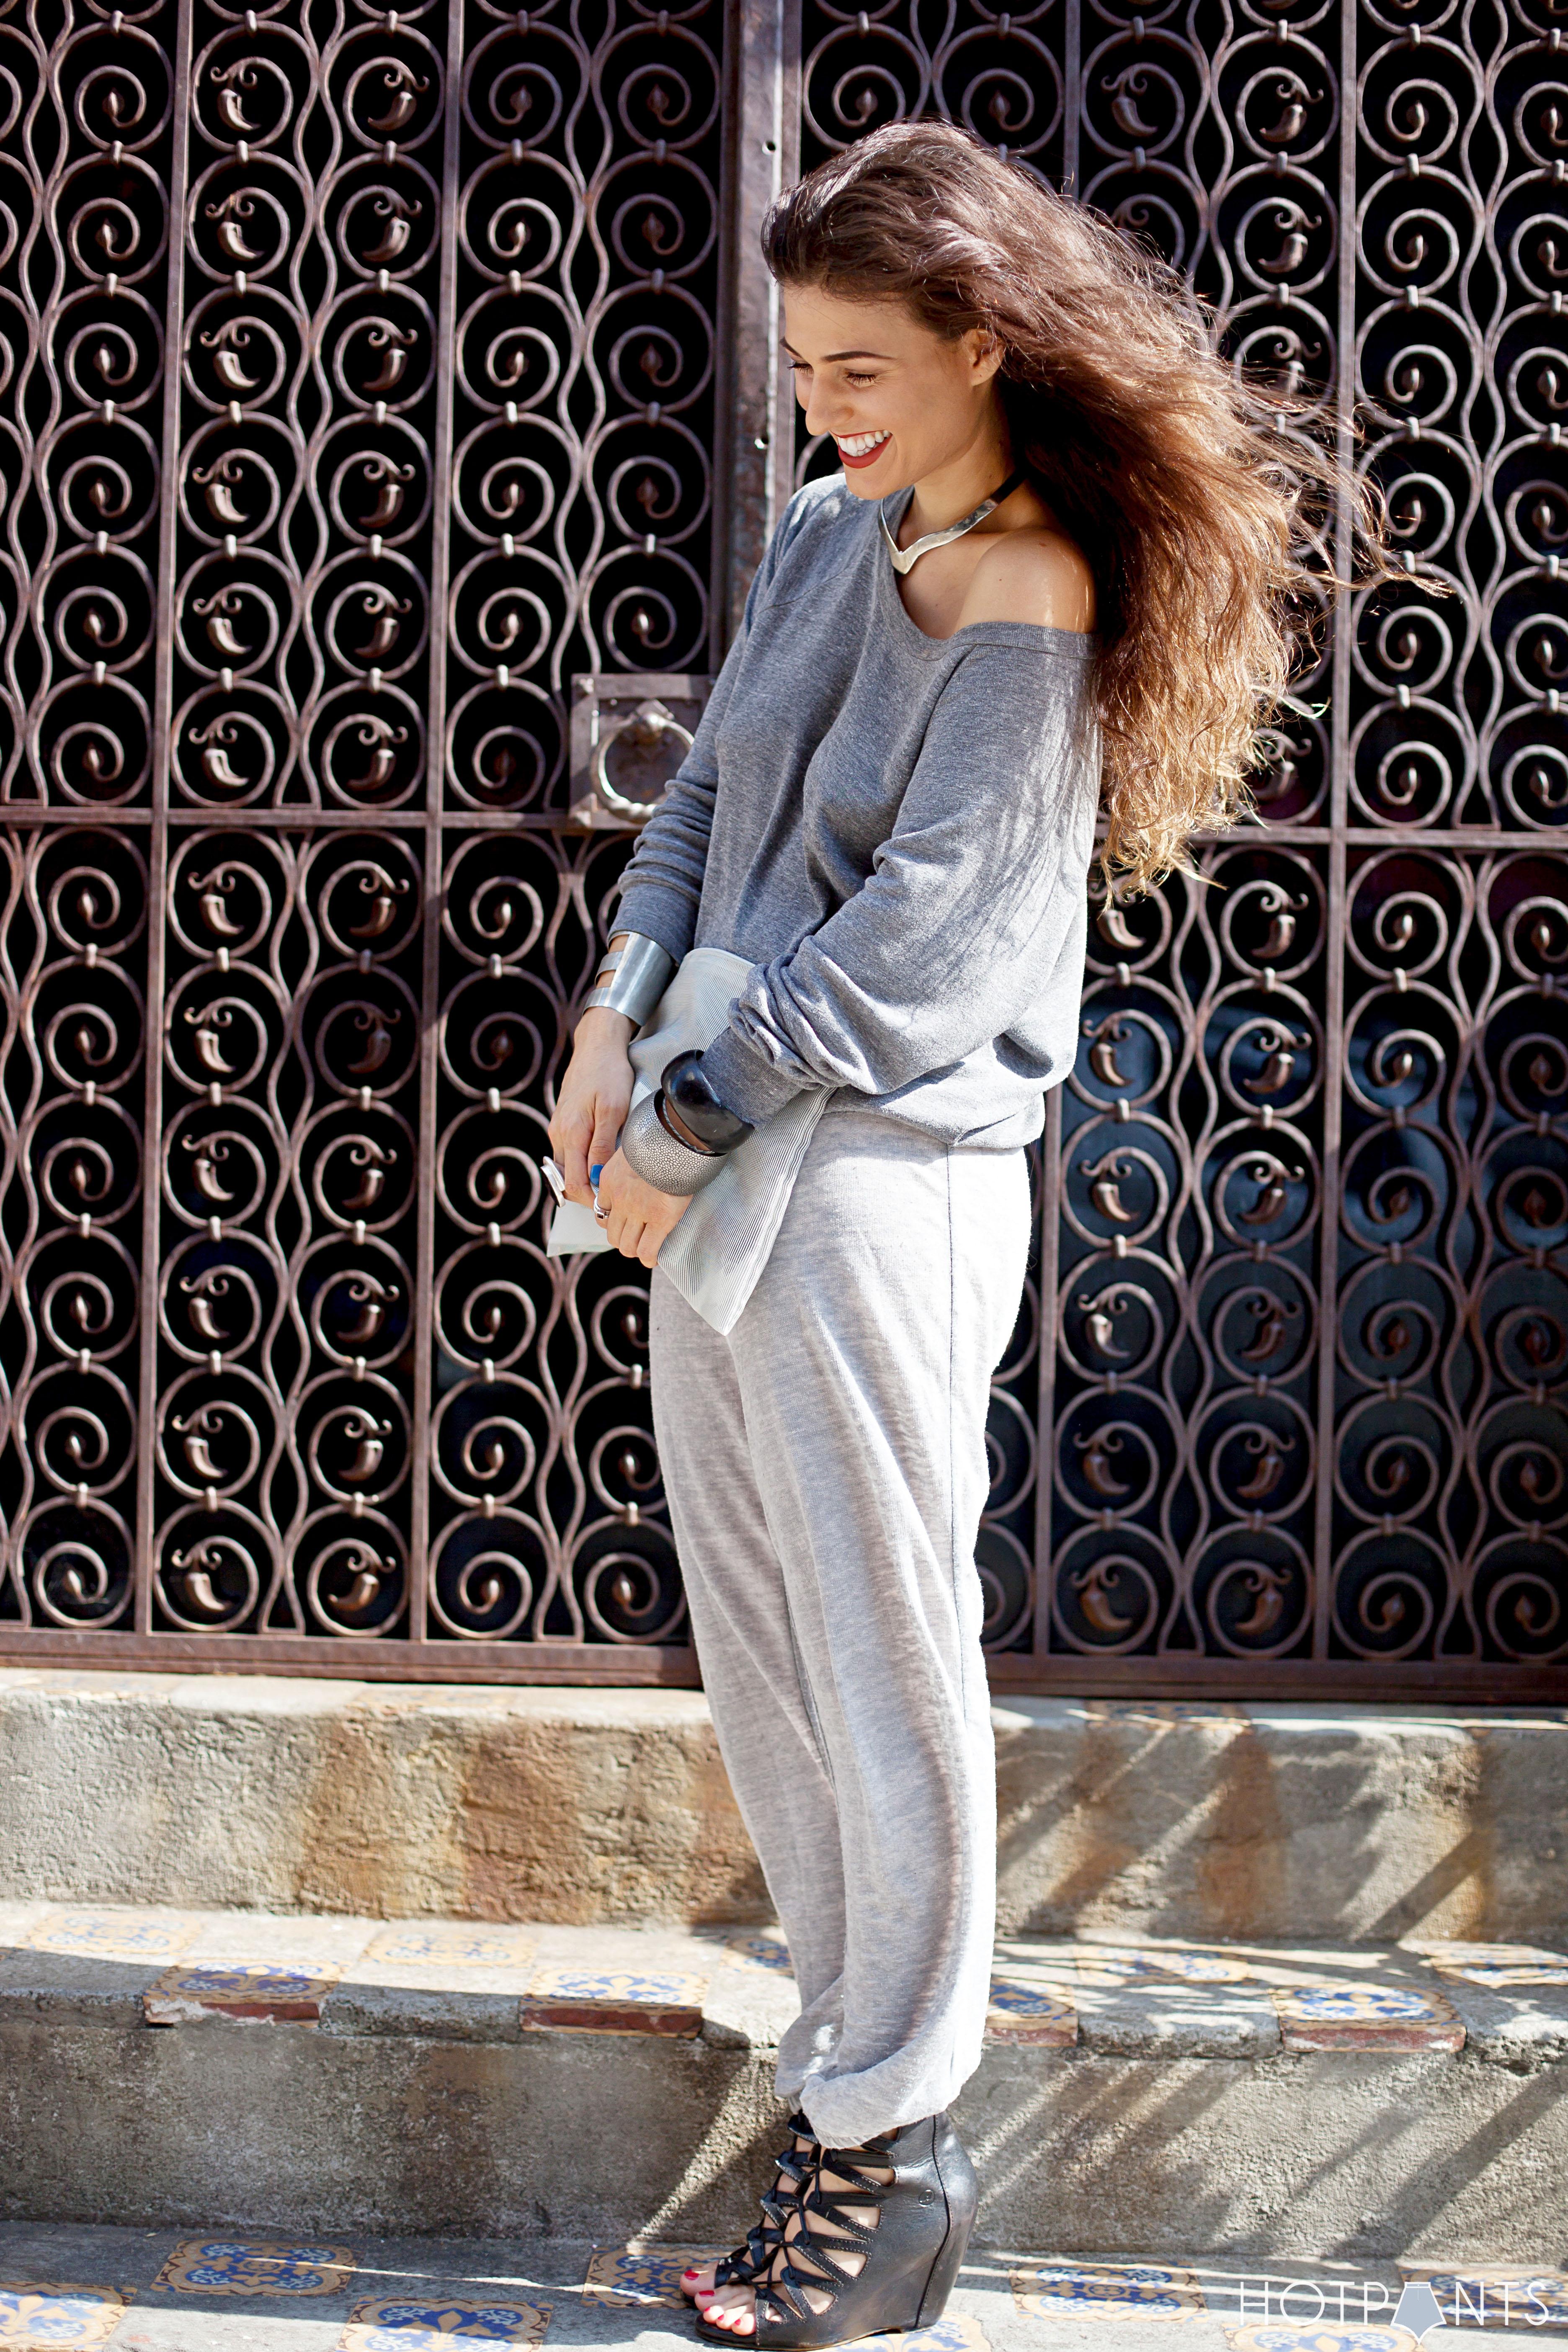 Mesh Purse Long Hair NYC Spring Street Style